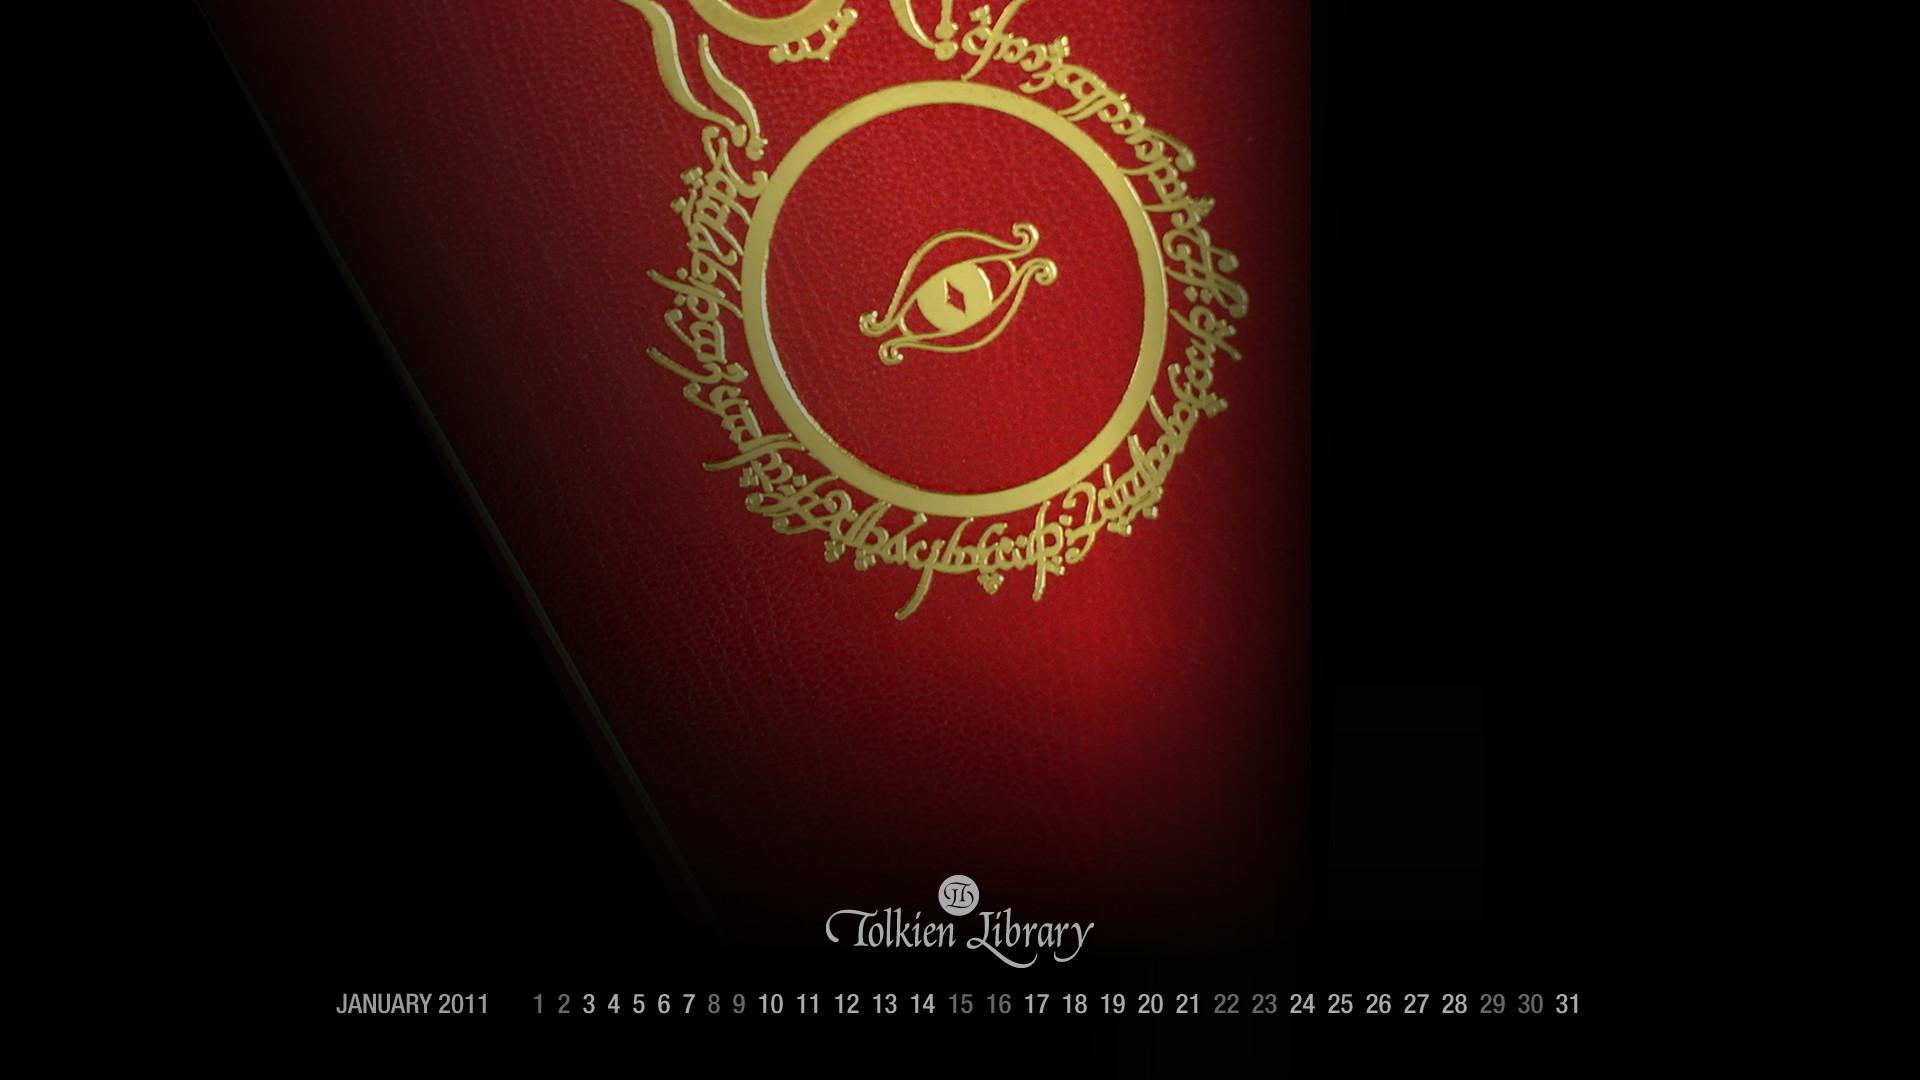 Res: 1920x1080, Tolkien Desktop Wallpaper Calendar 2 January 2011